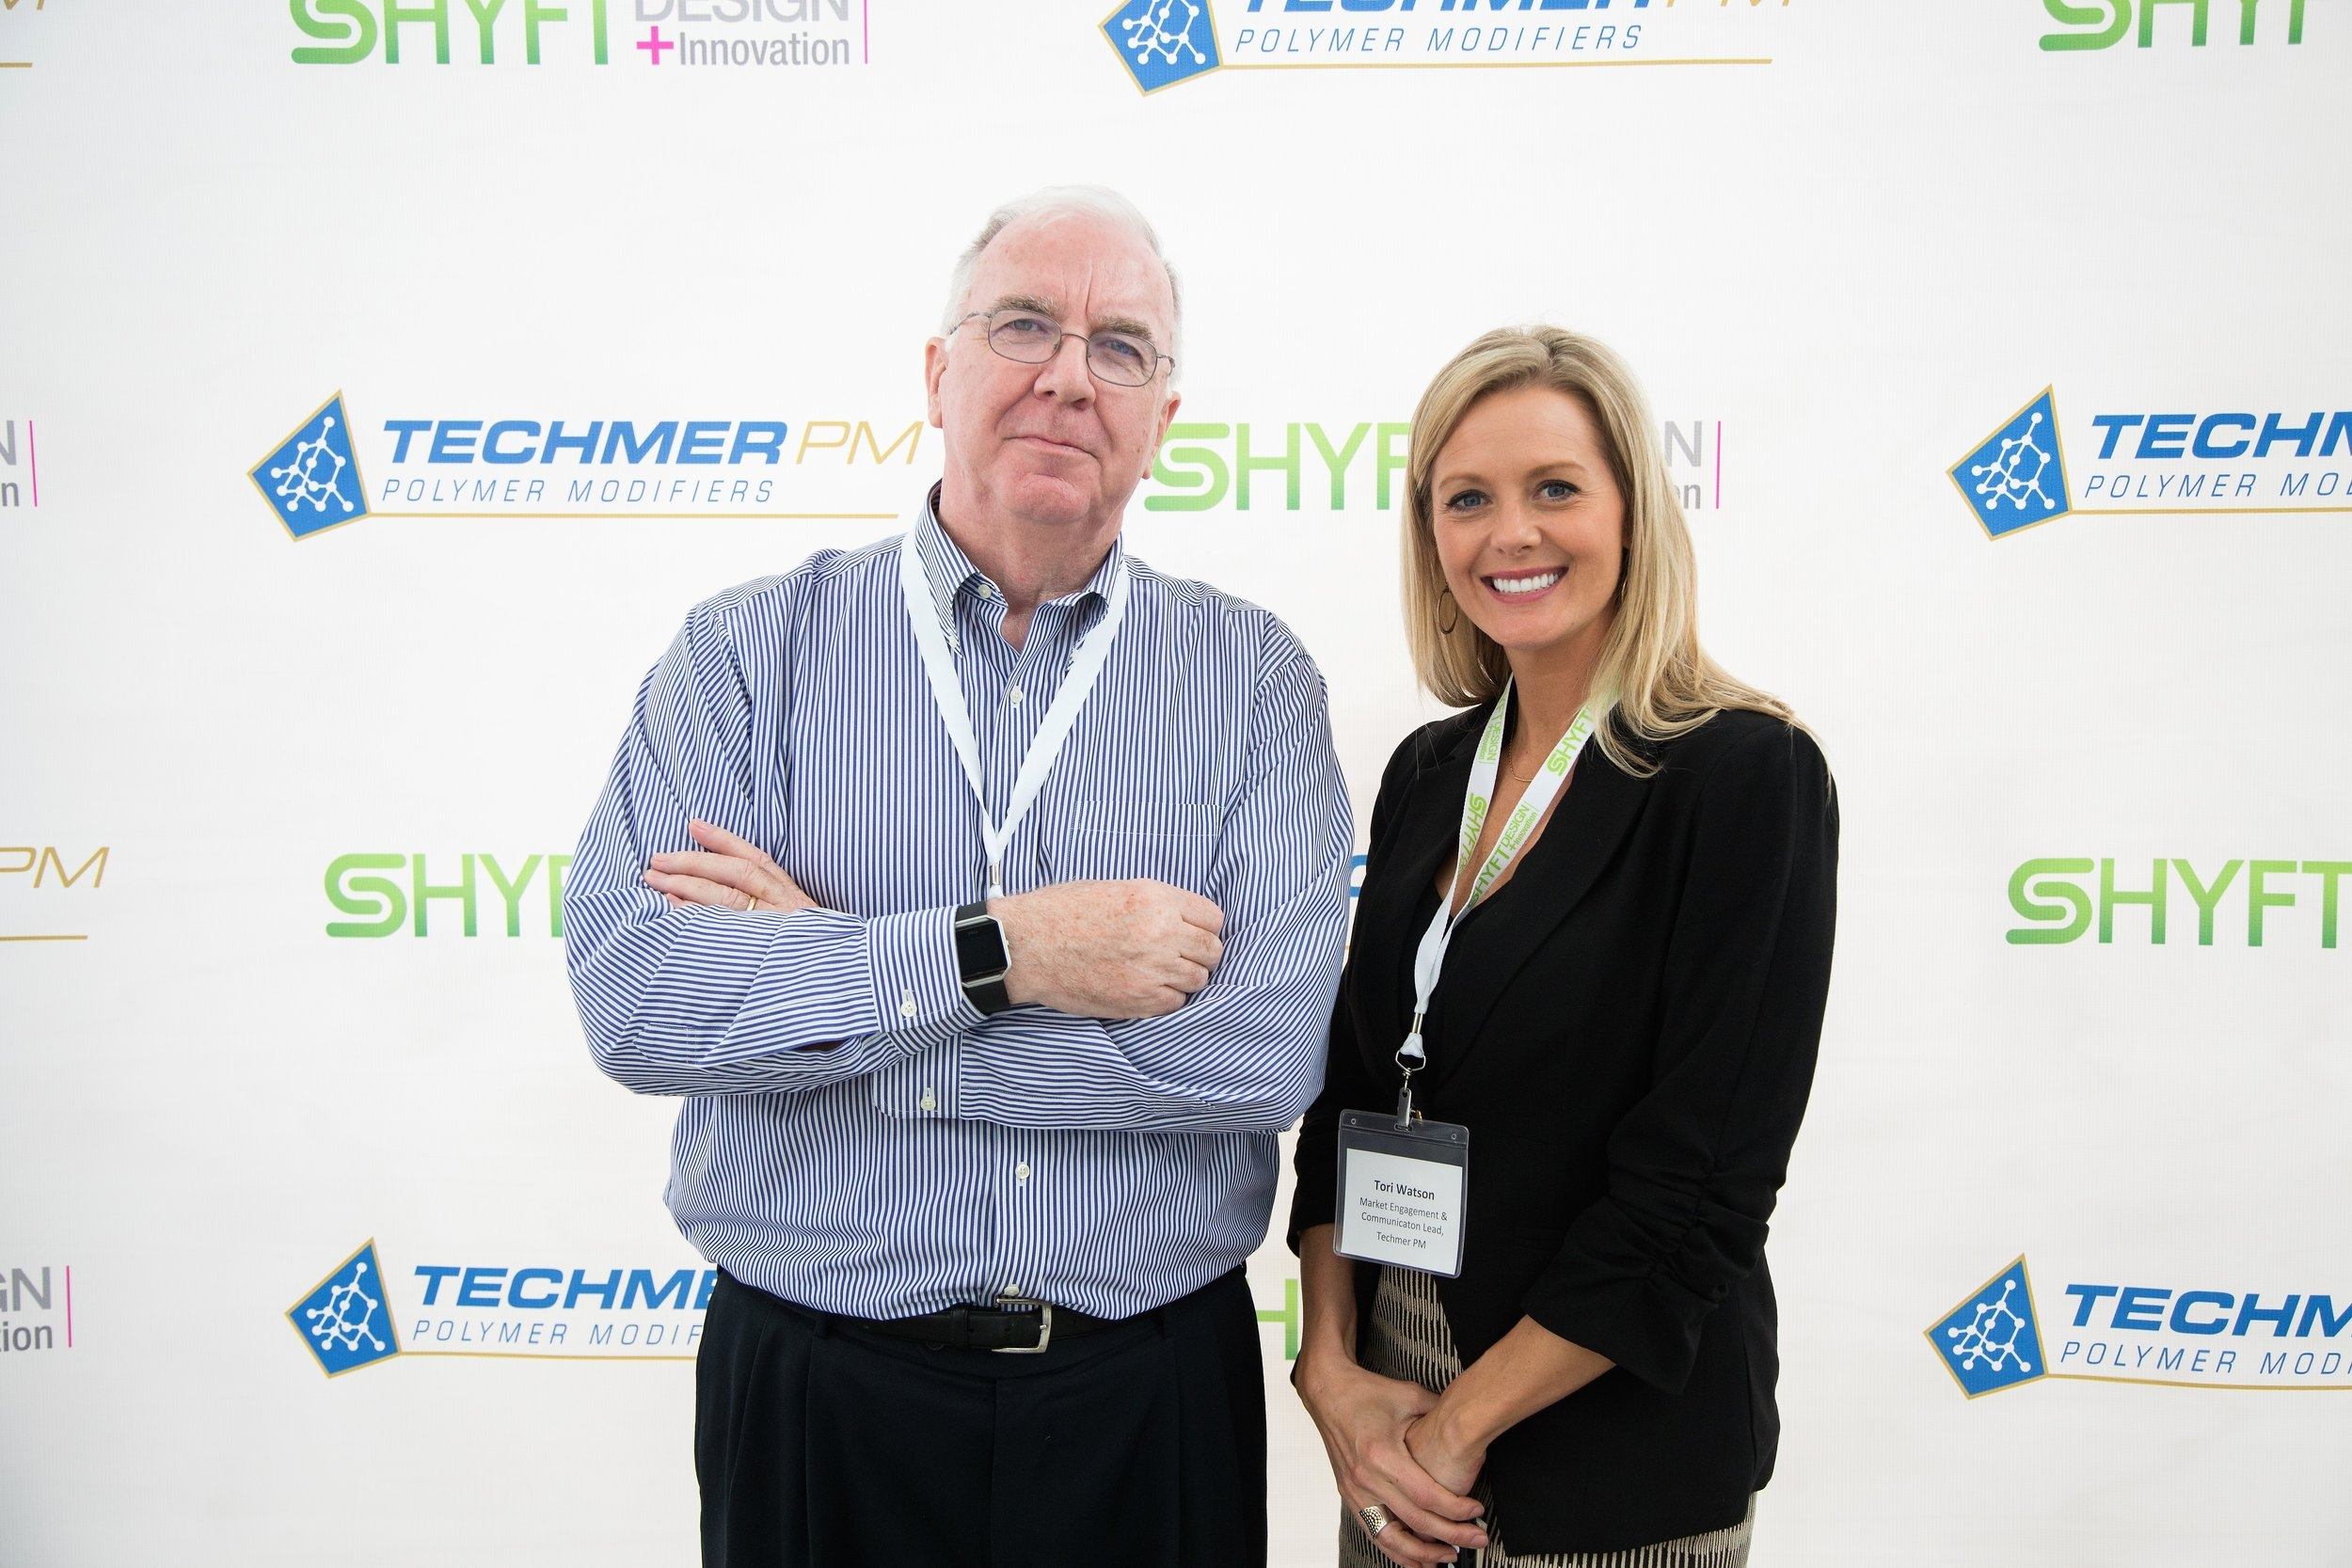 David Turner and Tori Watson